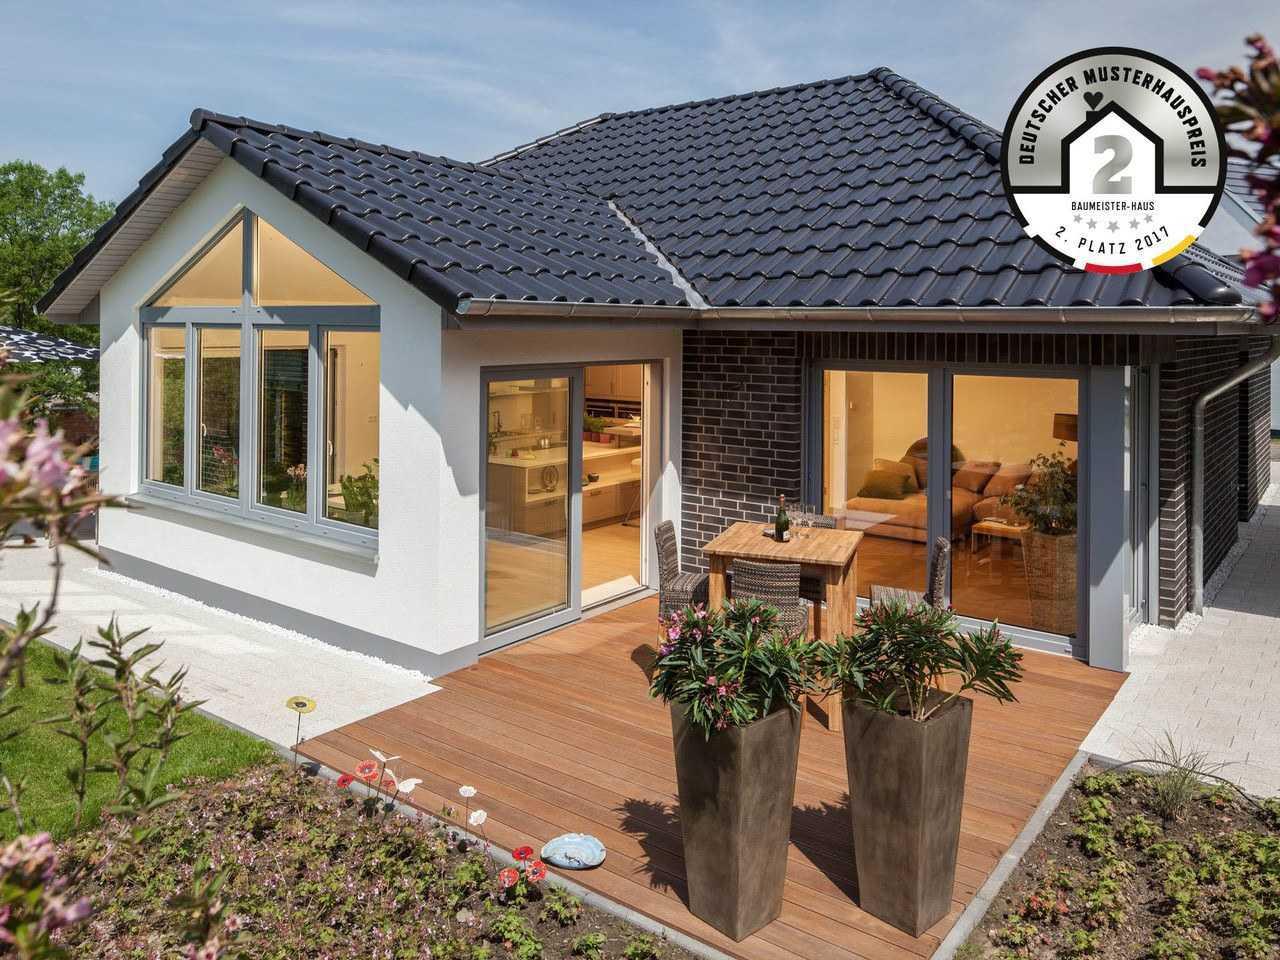 AIM Hausbau - Baumeister-Haus Bungalow Riedel